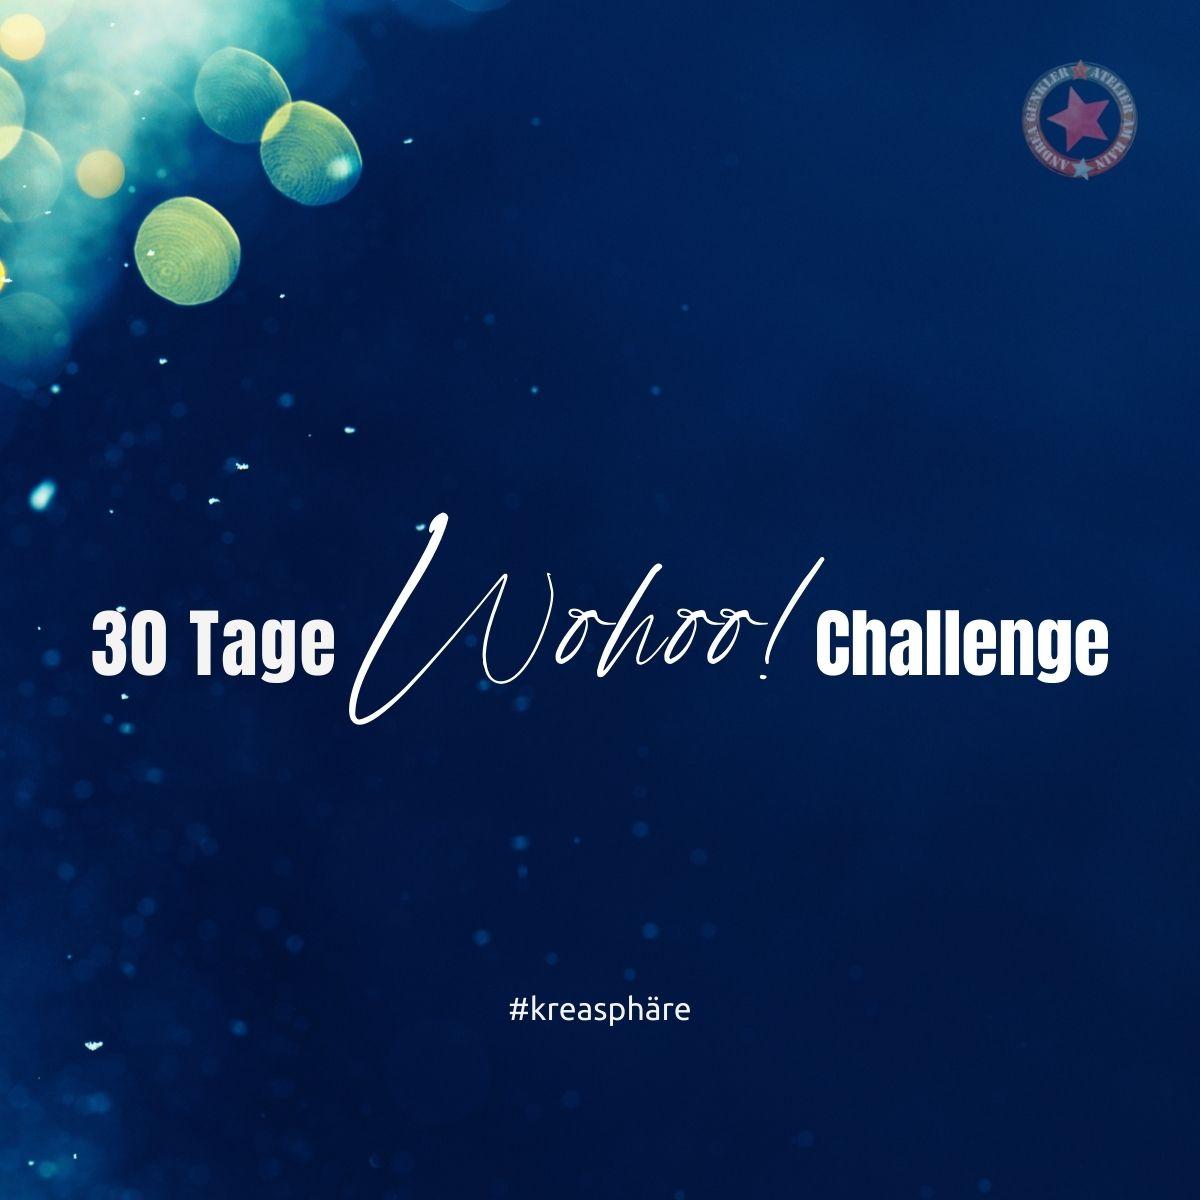 30 Tage Wohoo Challenge Titelbild